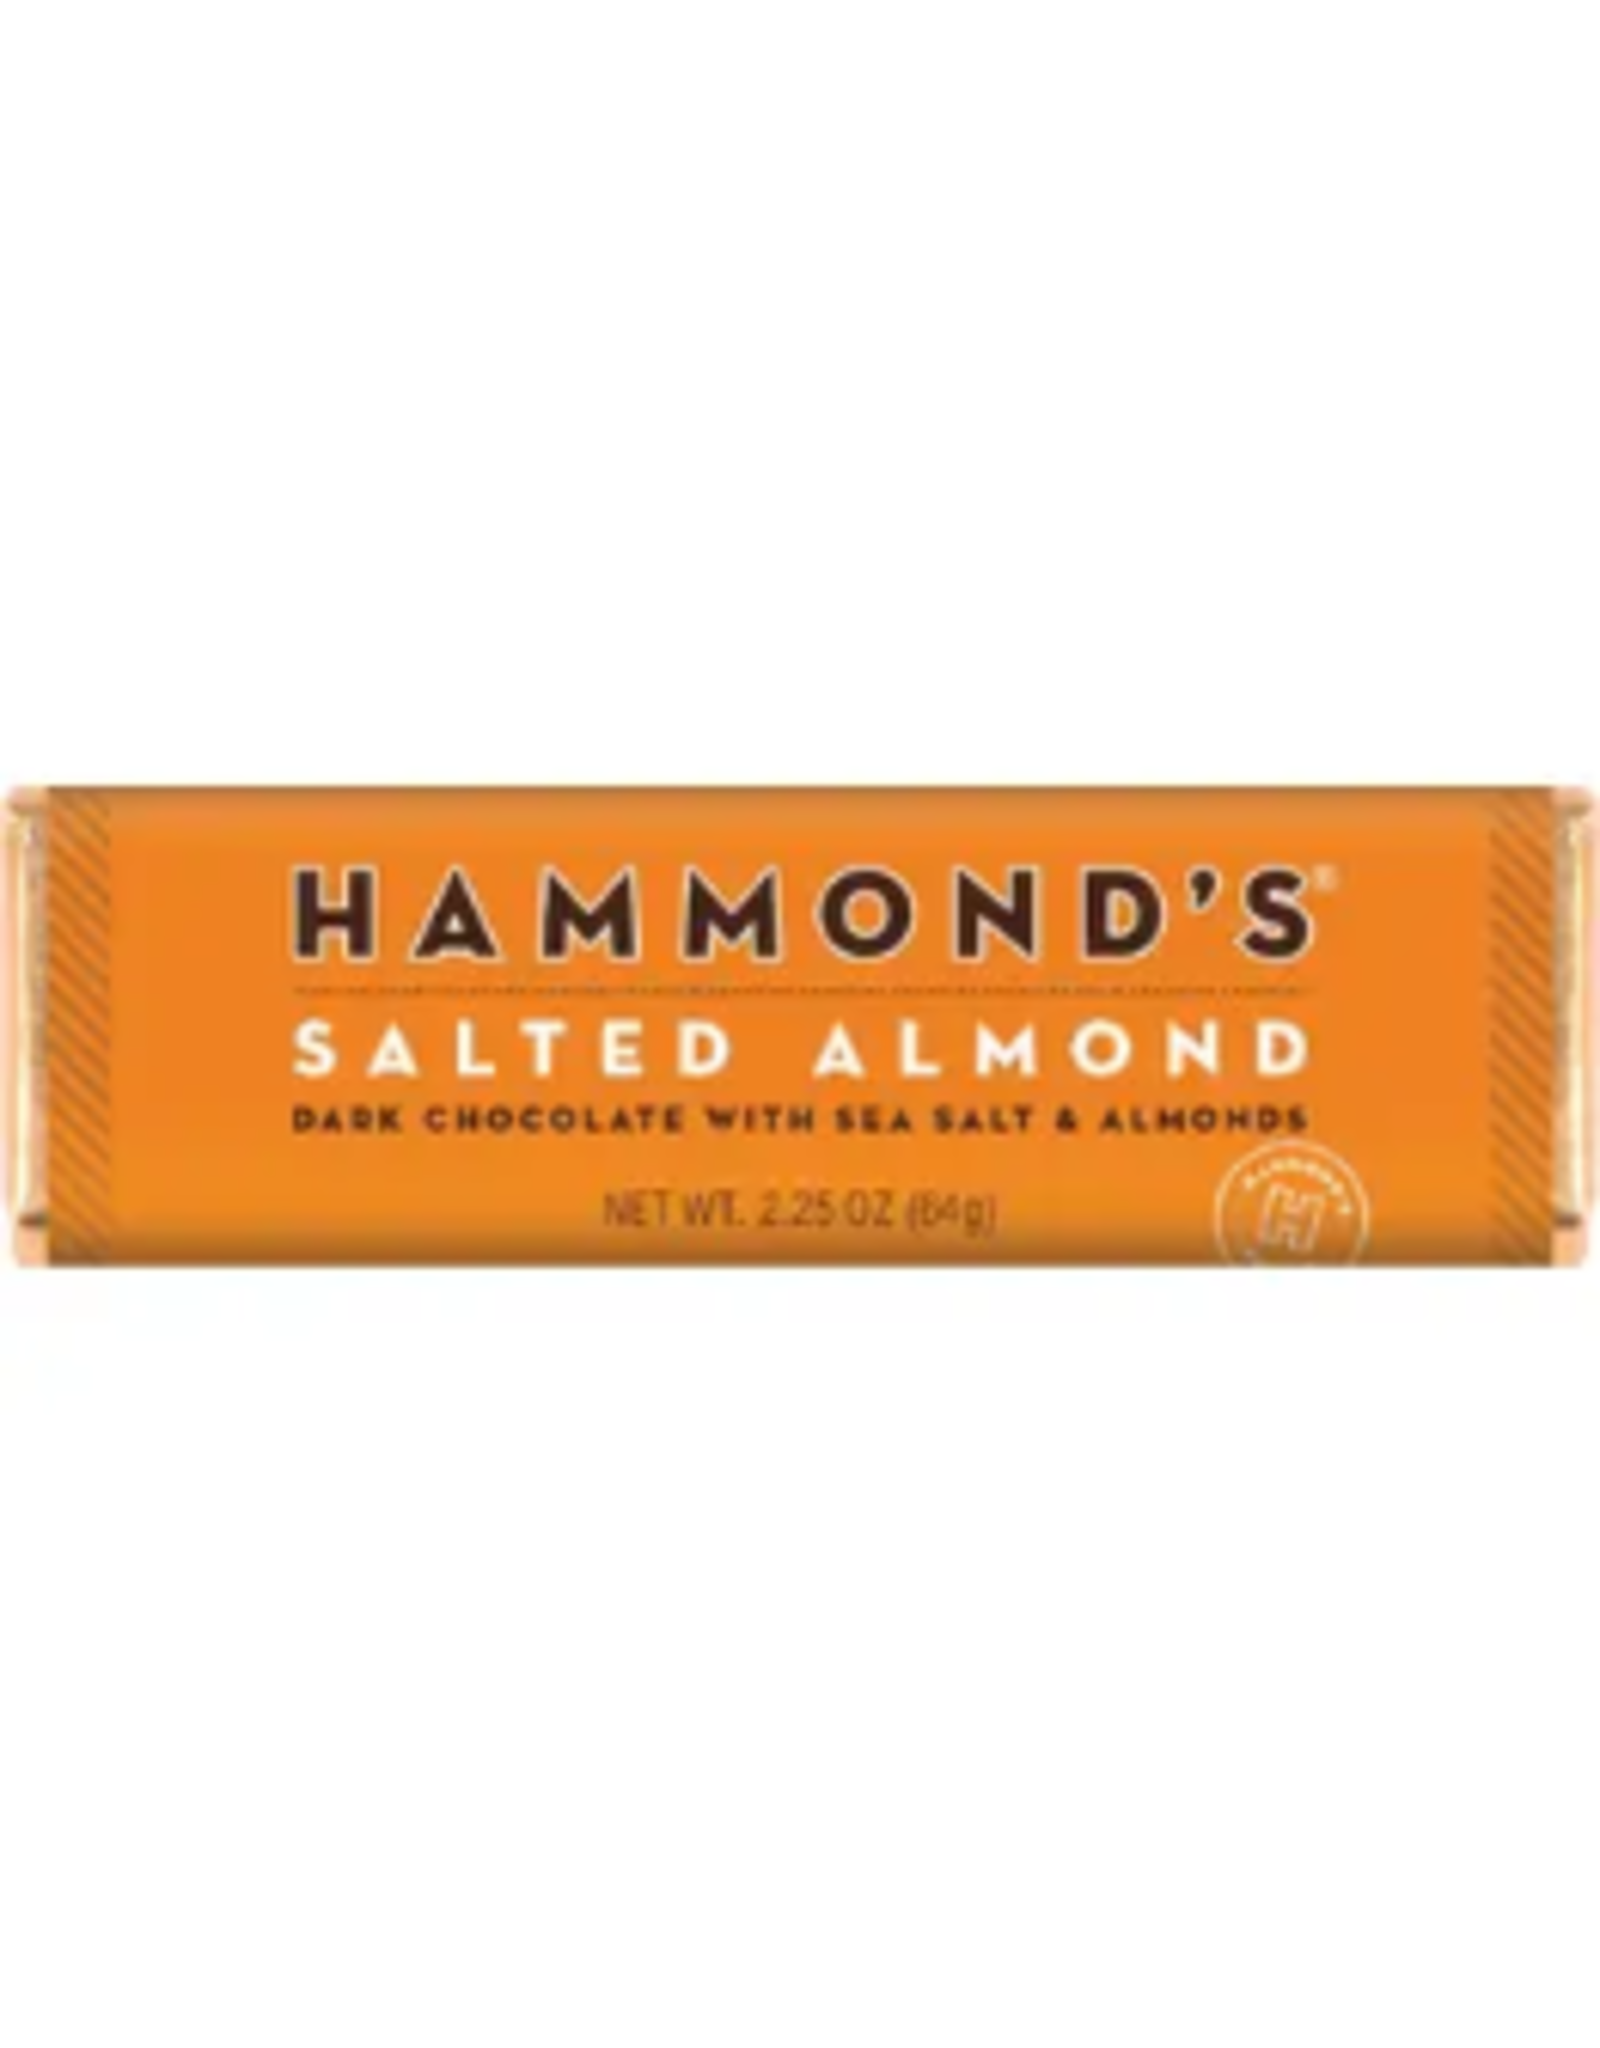 Salted Almond Chocolate Bar